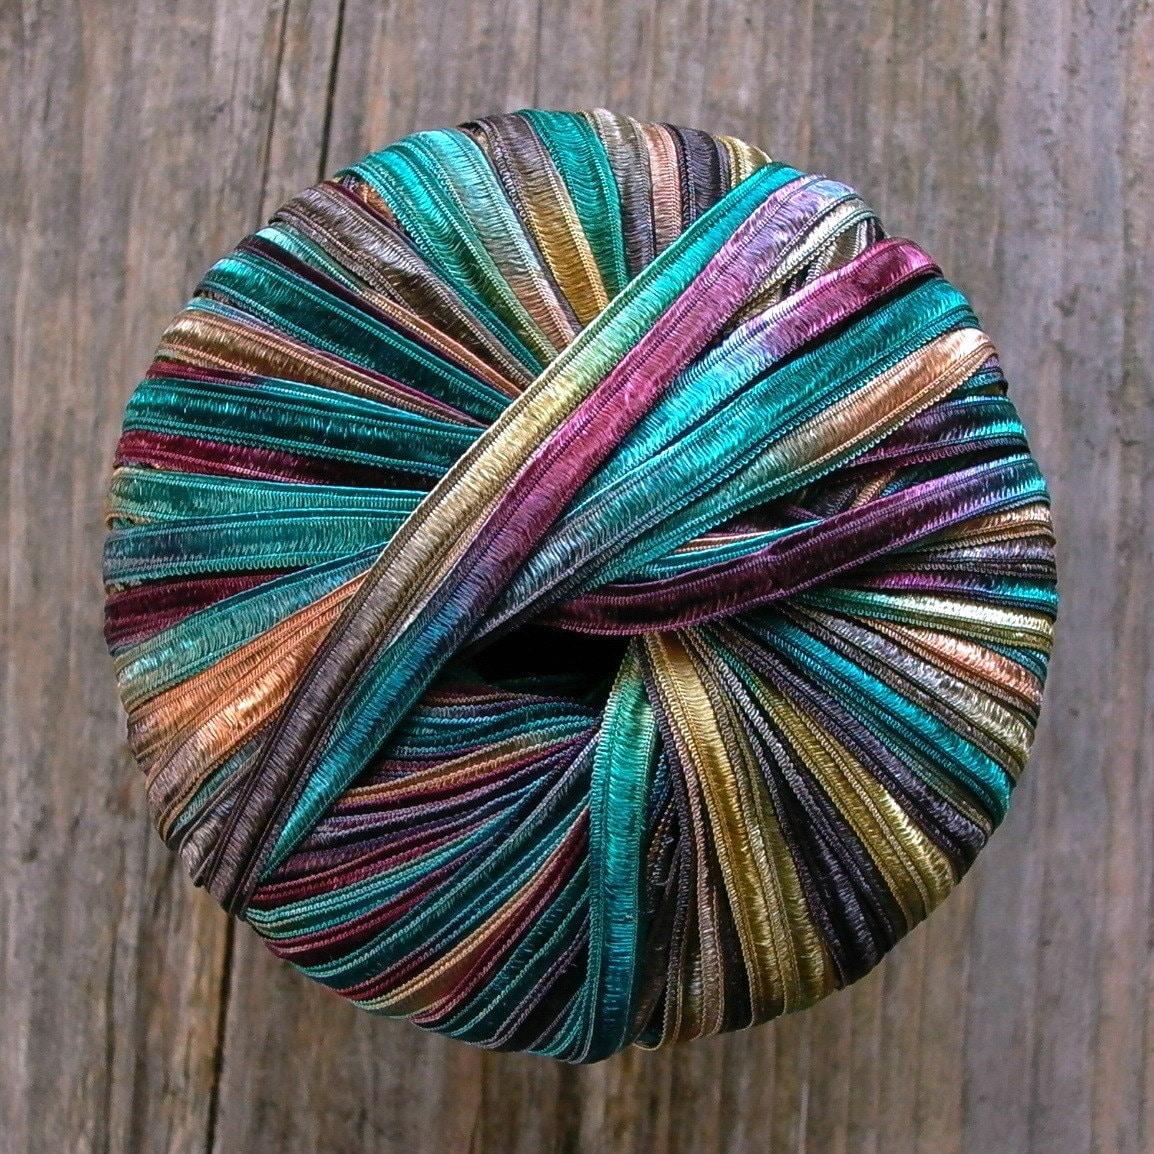 Italian Ribbon Yarn . Timberland . Berlini Memento Ribbon Yarn